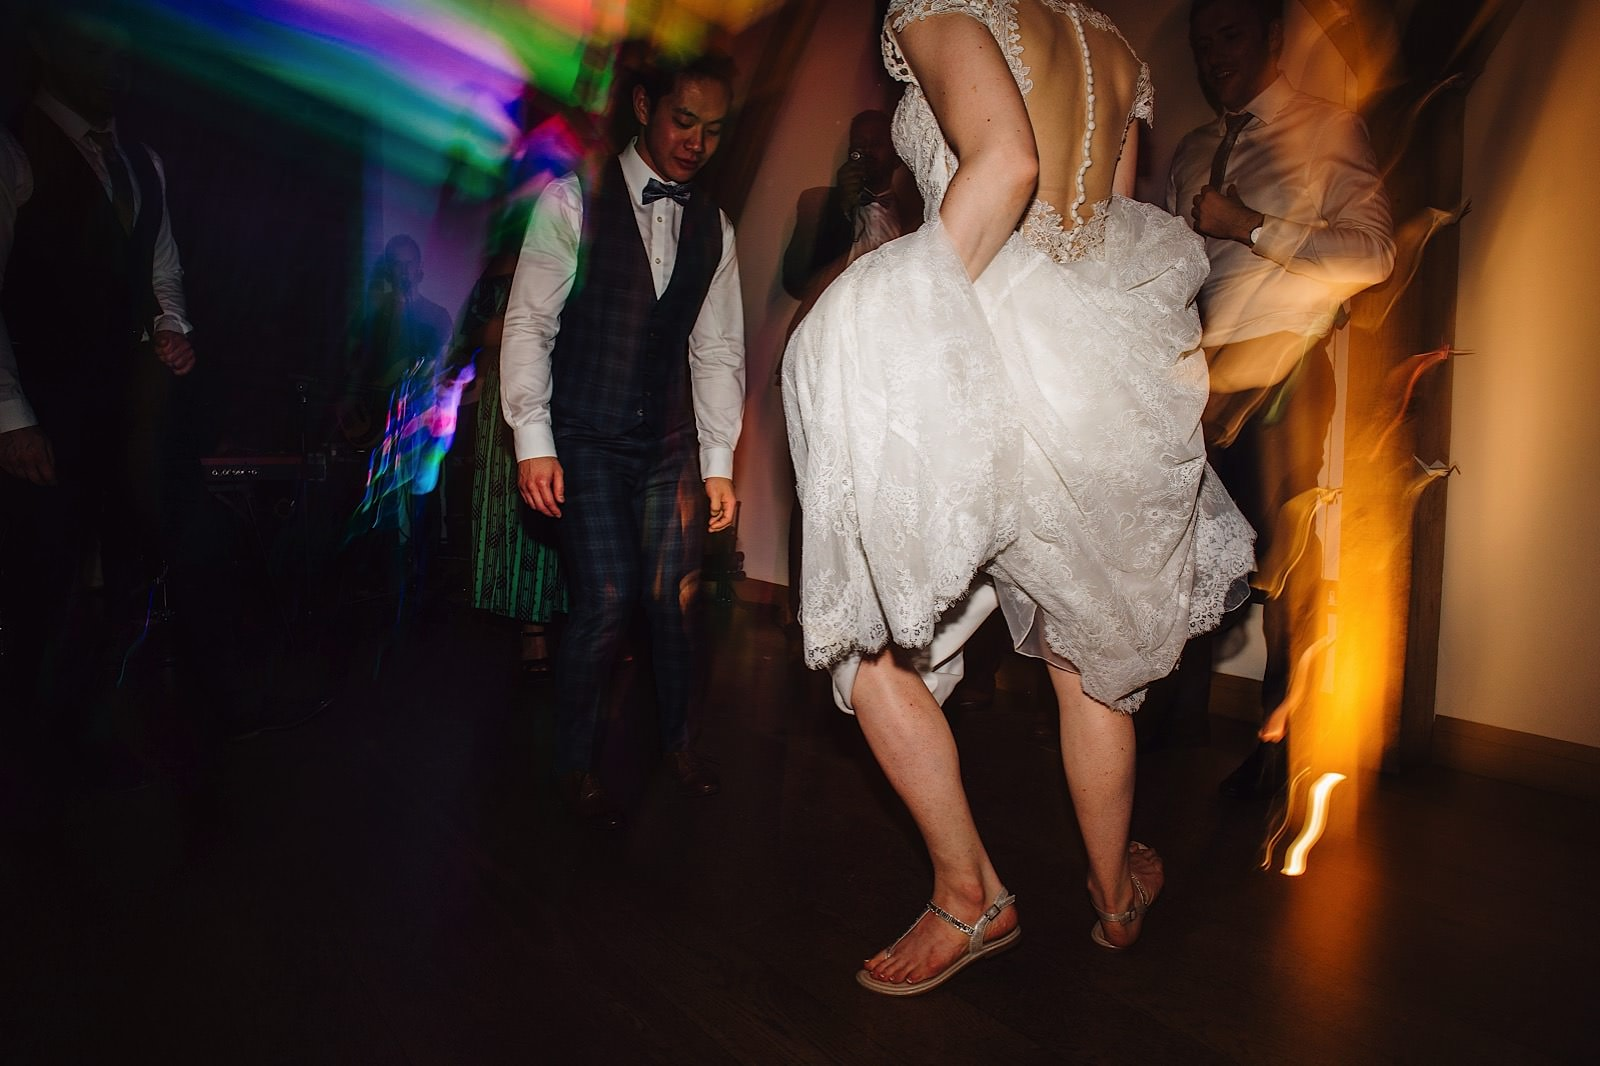 dodford manor northamptonshire wedding photography 0087